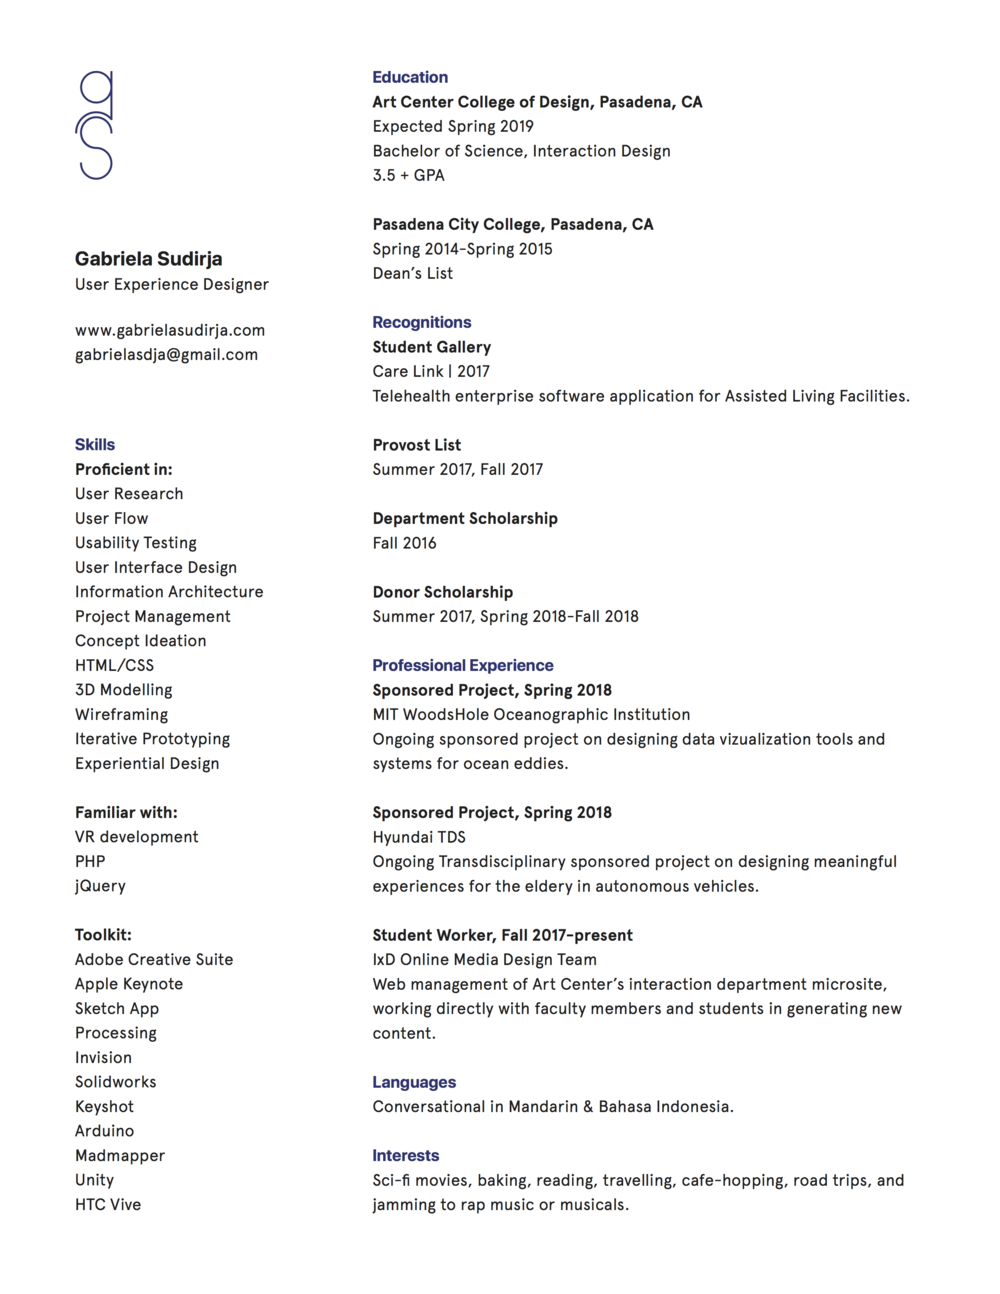 resumefinalweb_gabrielasudirja.png